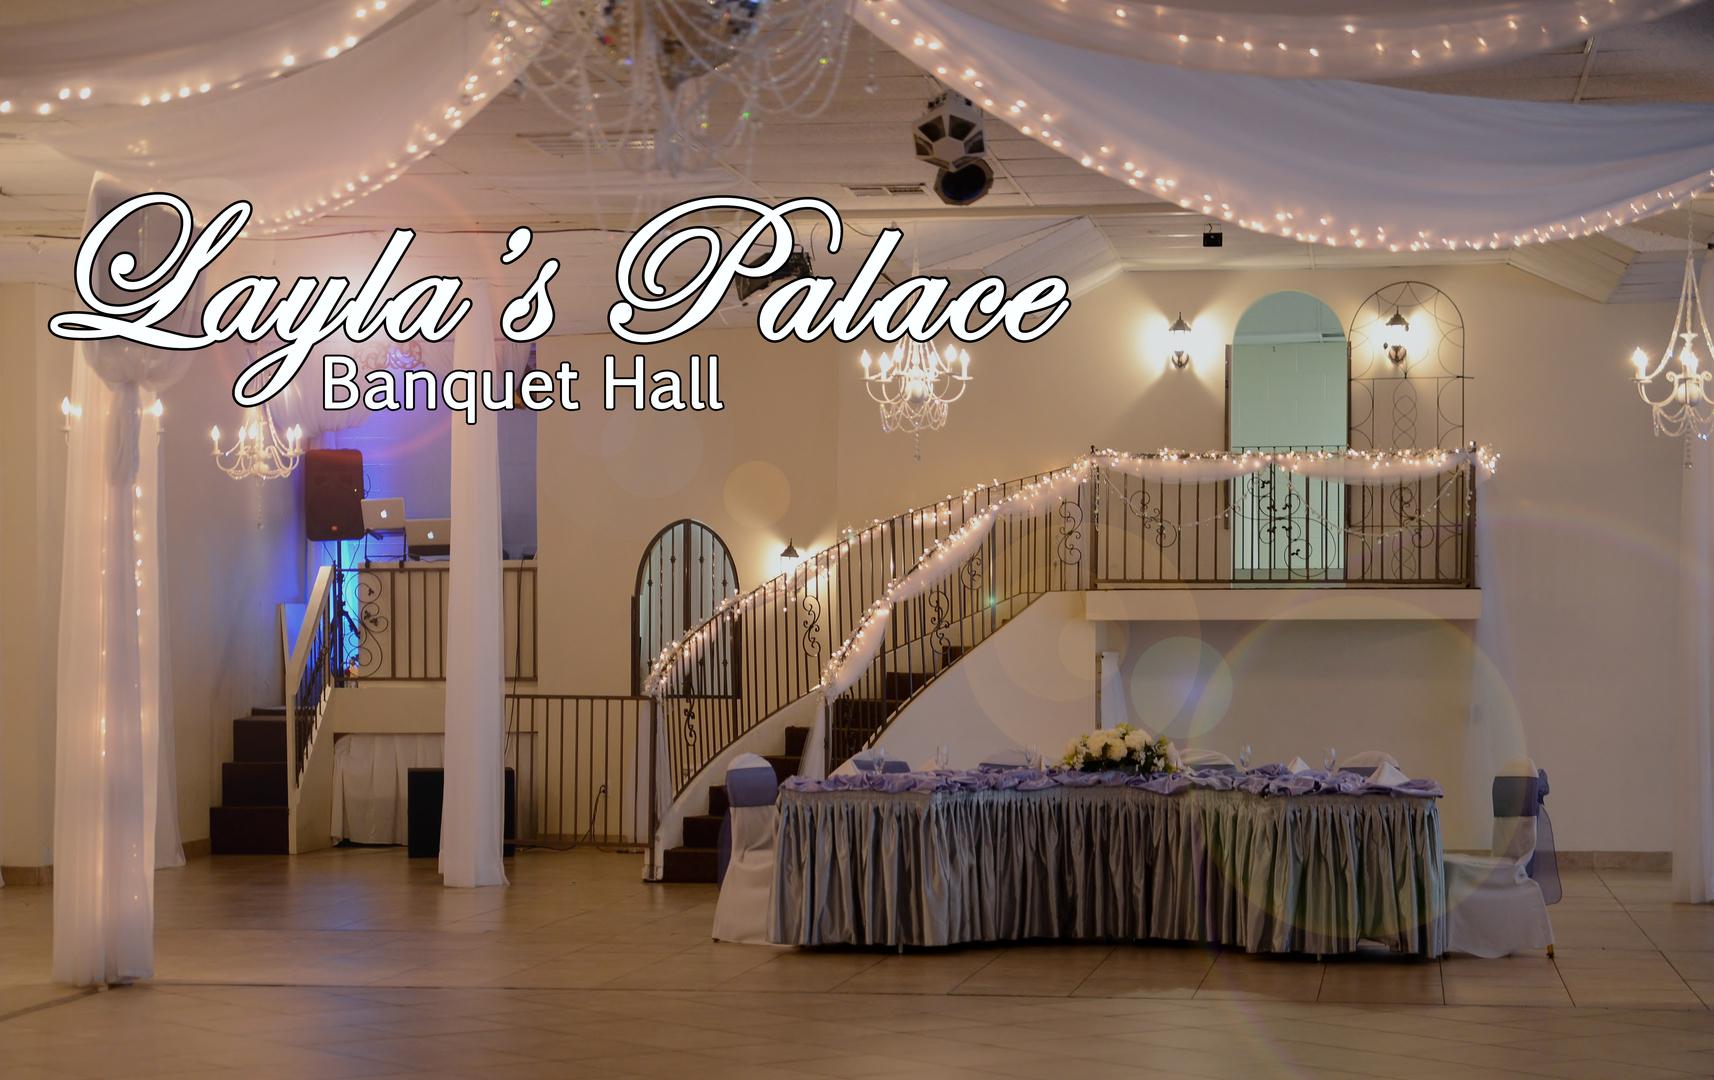 Laylas Palace Banquet Hall In Las Vegas Nv